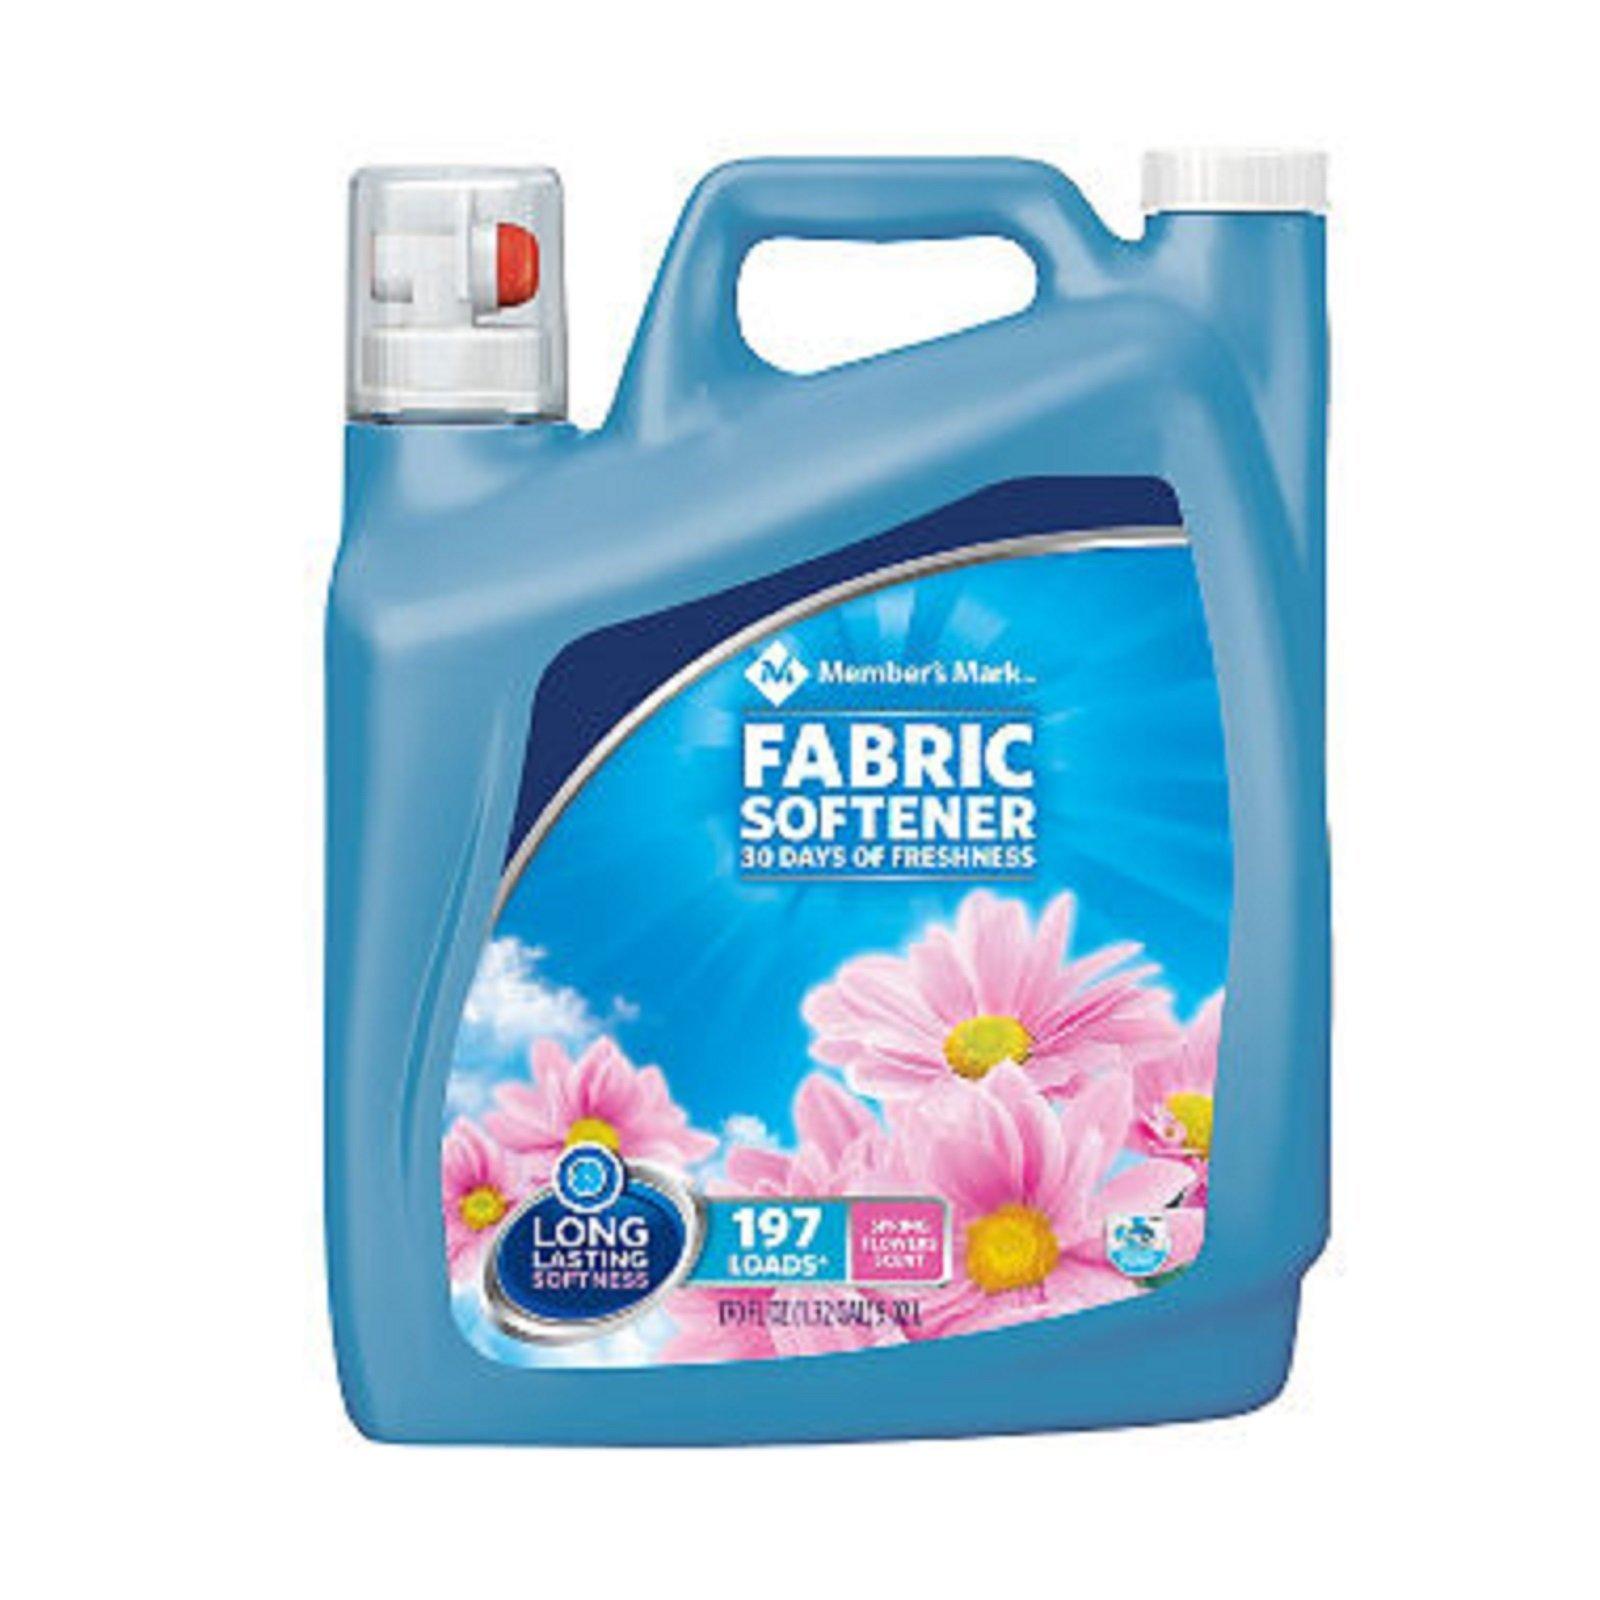 Amazon.com: Member's Mark Ultimate Clean Liquid Laundry